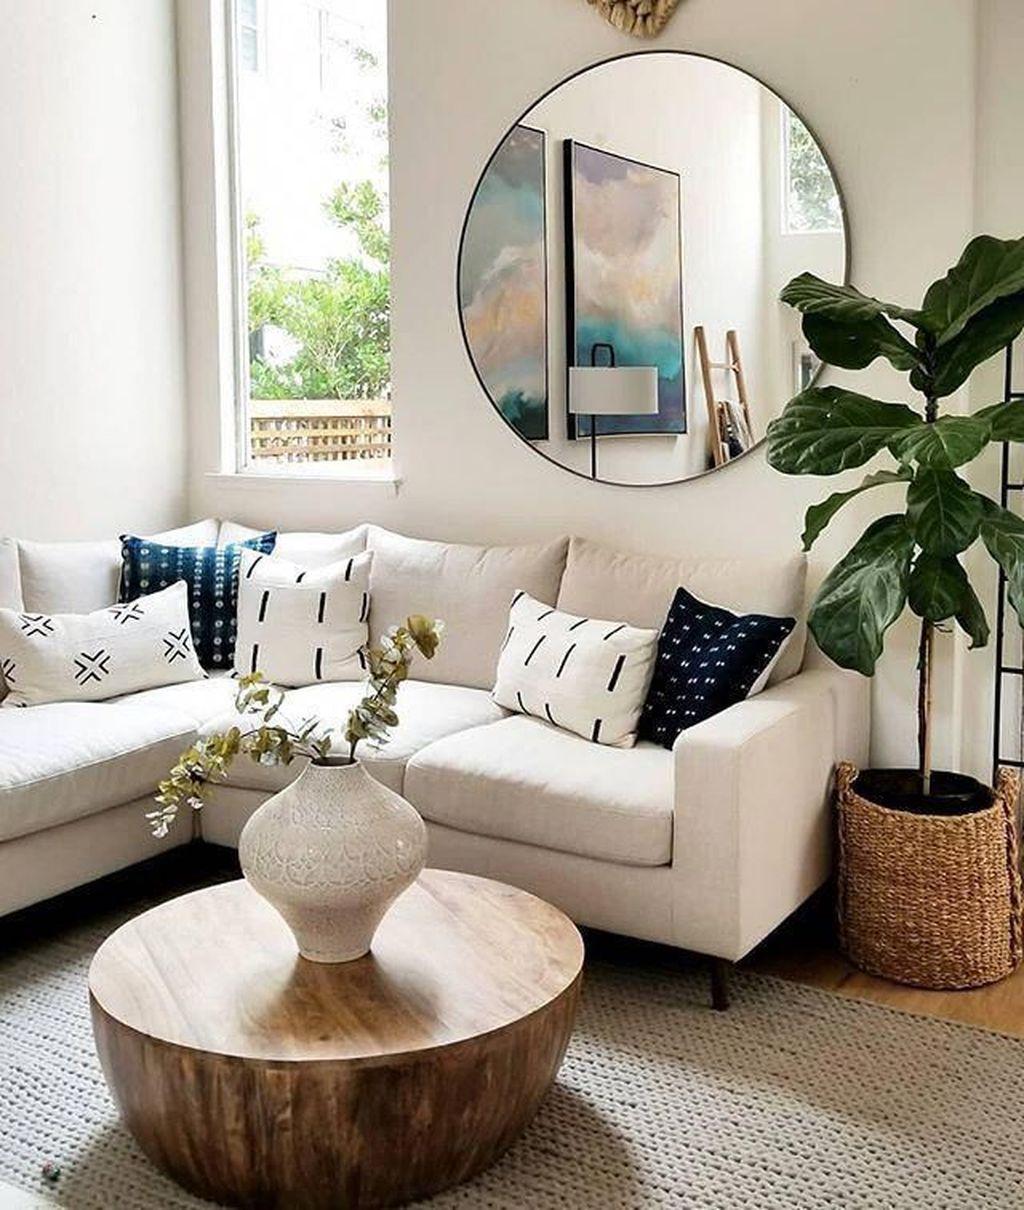 31 Admirable Modern Living Room Design Ideas You Should Copy Homyhomee Living Room Designs Farm House Living Room Living Room Design Modern